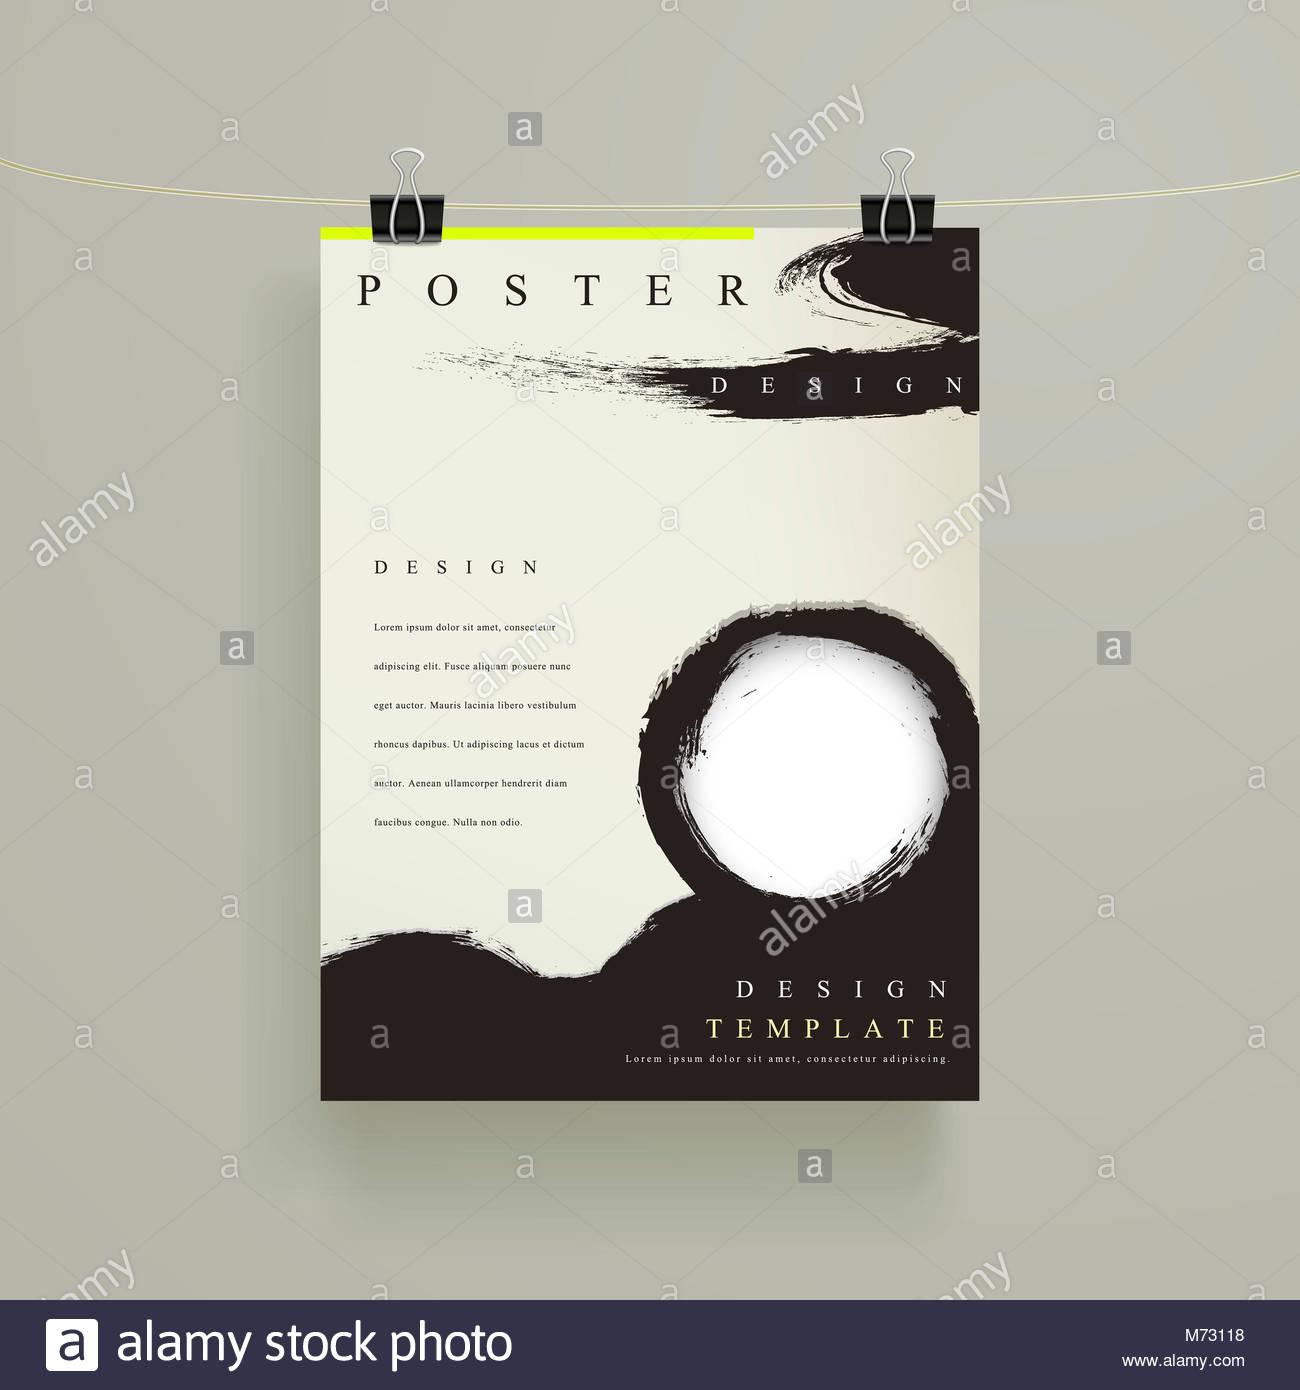 Wunderbar Vermisste Poster Vorlage Galerie - Entry Level Resume ...